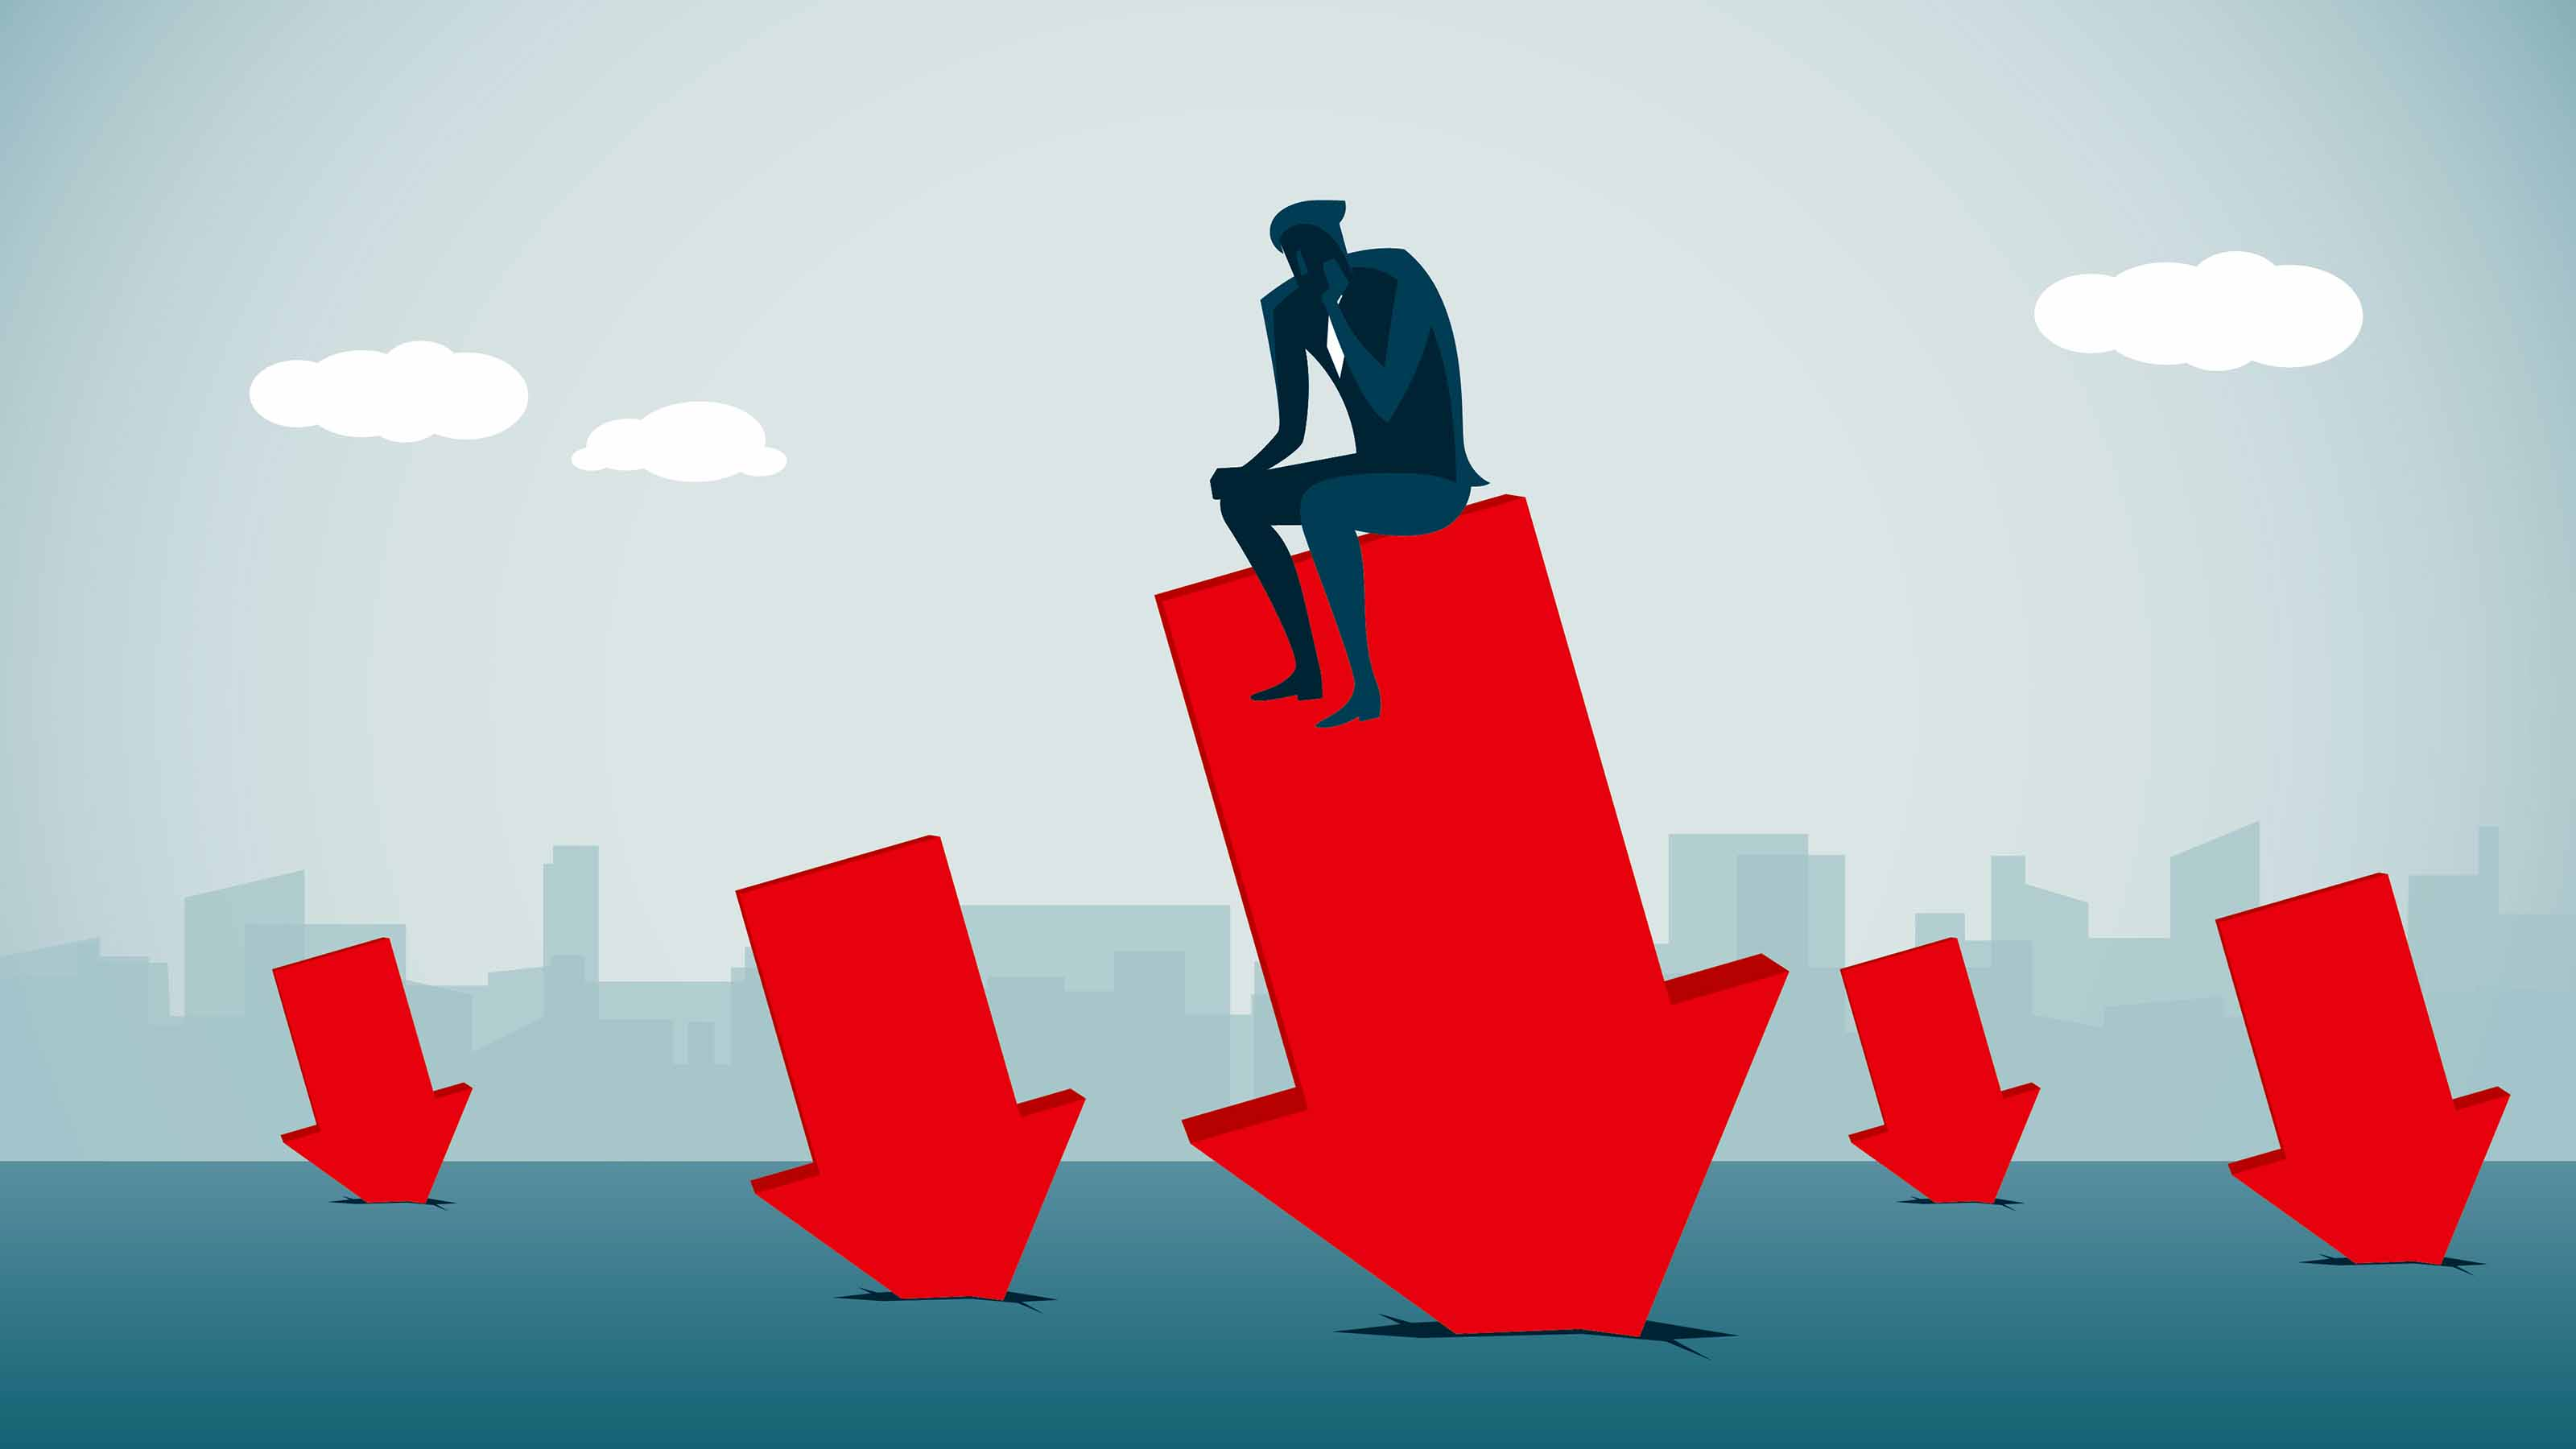 Stock Market Today: Stocks Tank as Interest-Rate Fears Persist | Kiplinger